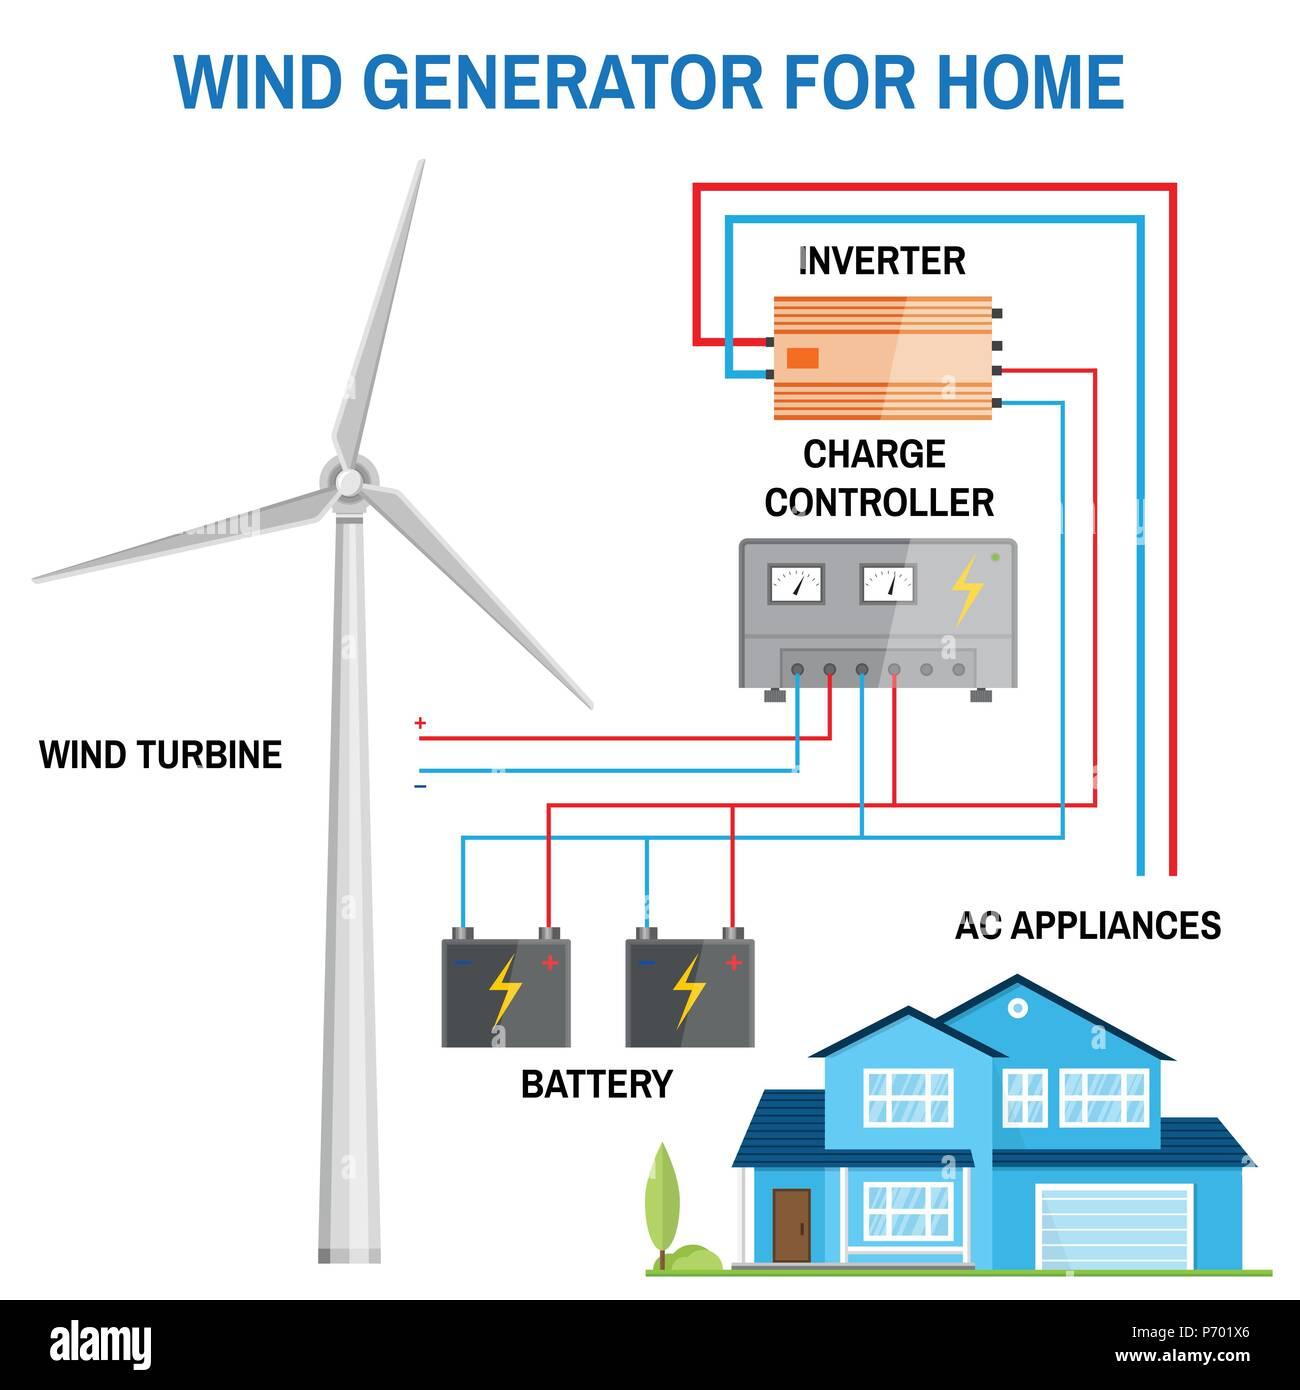 Wiring Diagram For Heater Element Also 480v Generator Wiring Diagram